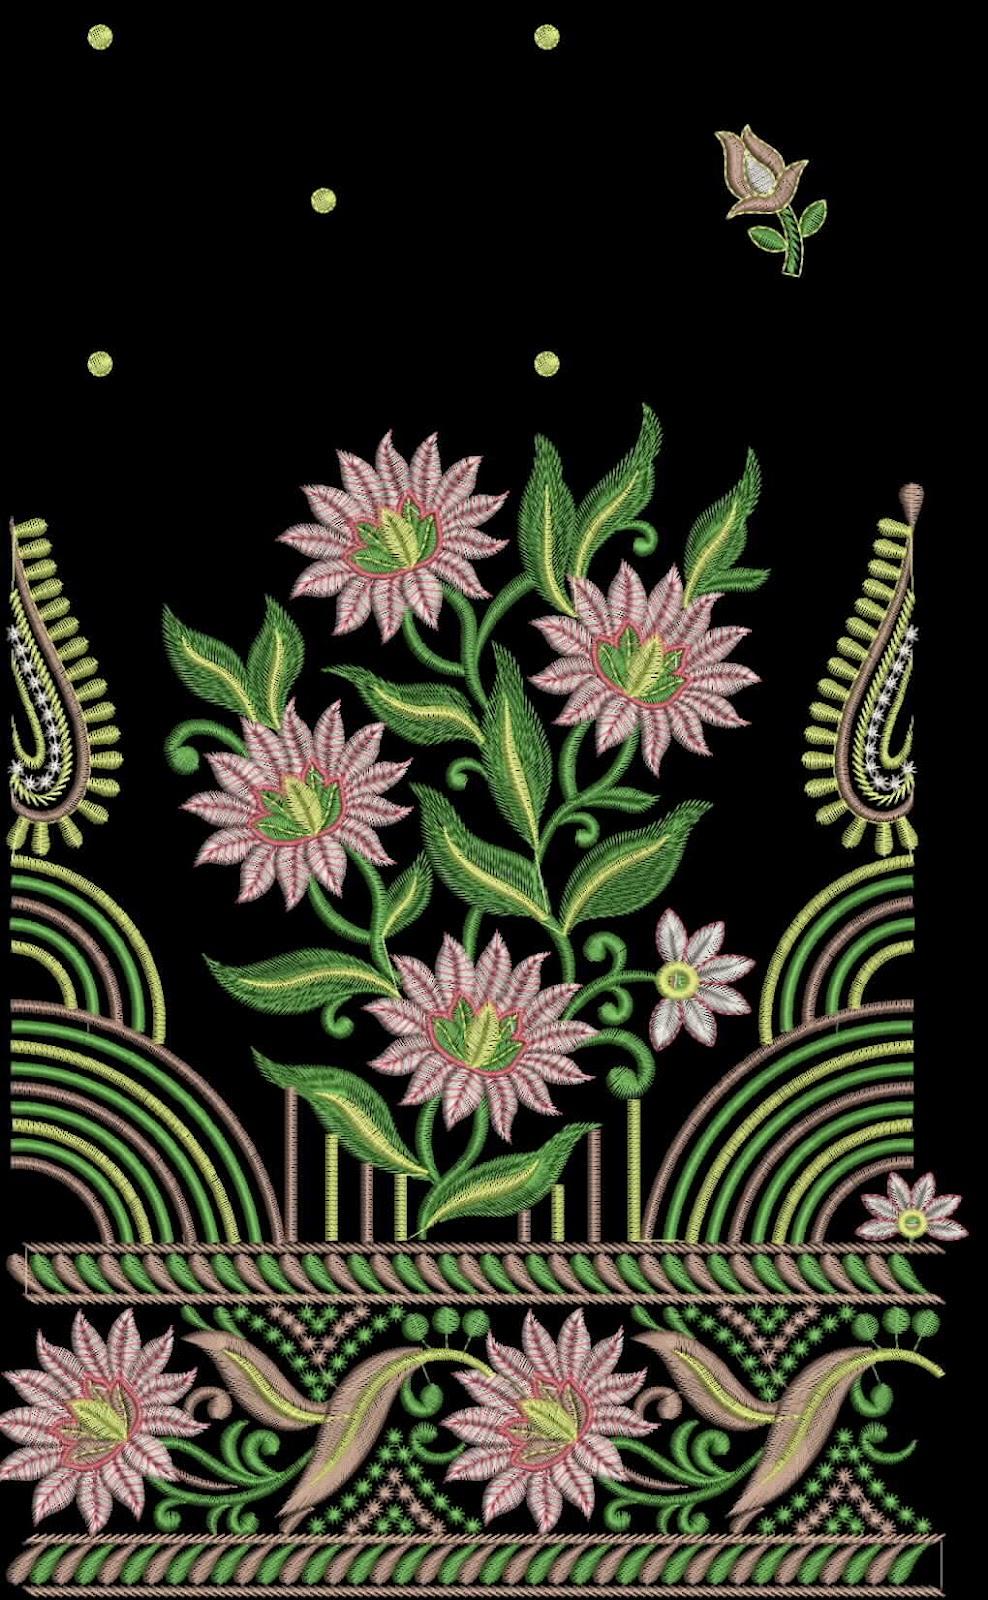 Designs Embroidery Motifs Freebies Download  Joy Studio